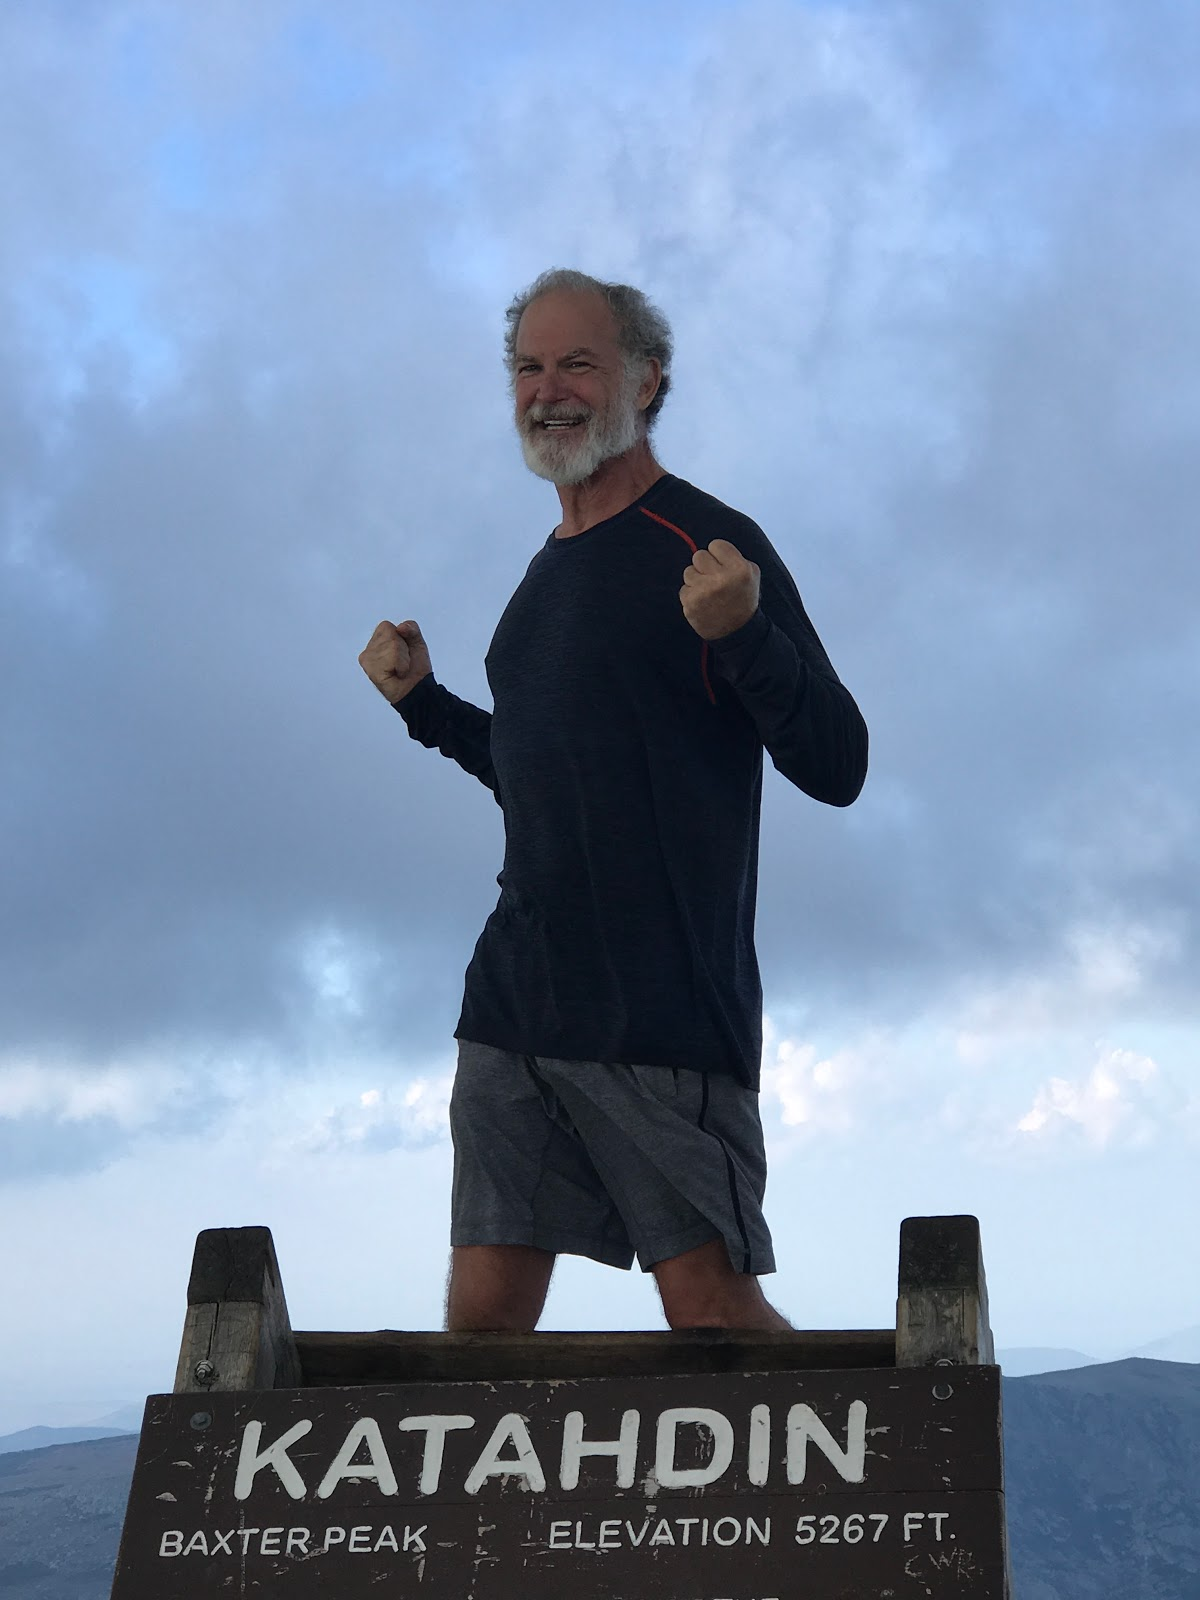 Byron Van Buren Appalachian Trail Thru-Hike 2017